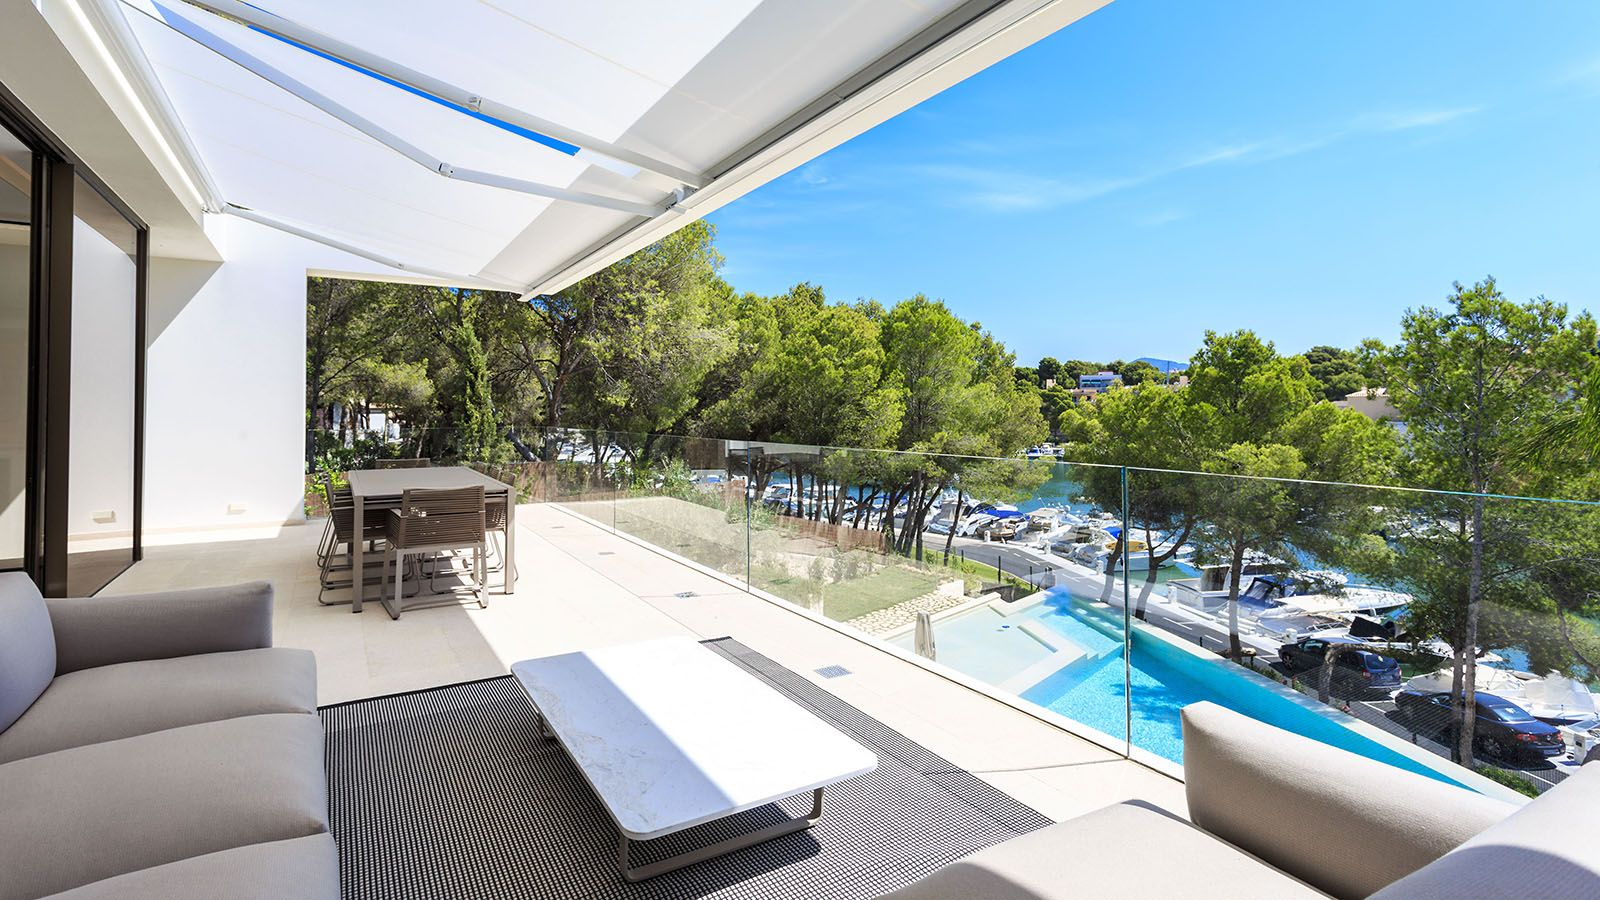 Luxusvilla Am Yachthafen Immobilien Mallorca Luxus Villa Immobilien